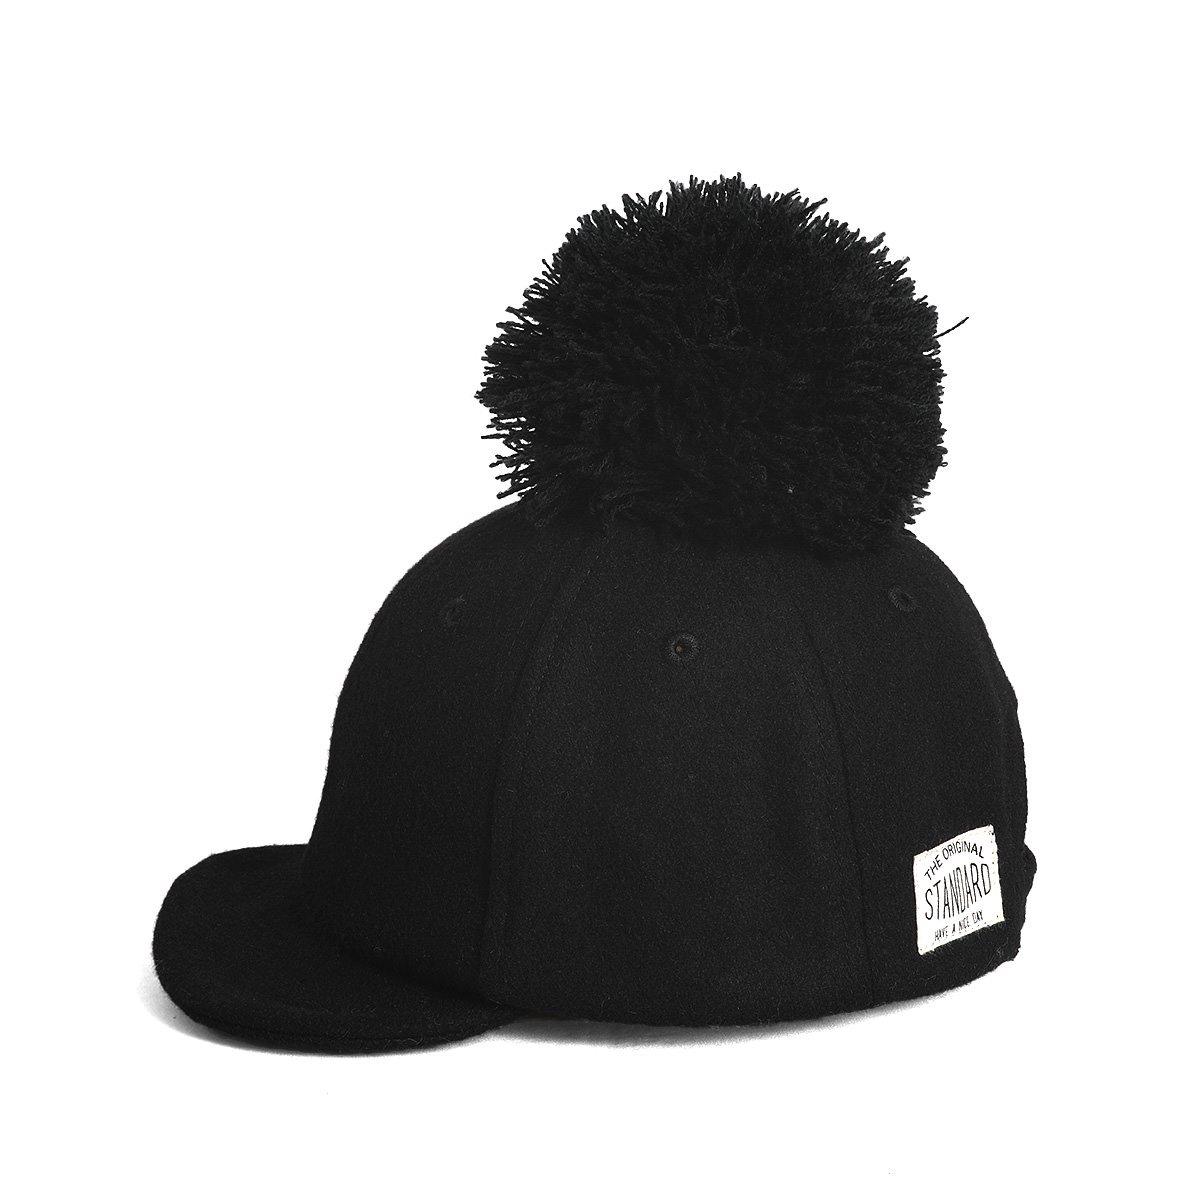 【KIDS】Wool Pom Cap 2 詳細画像5